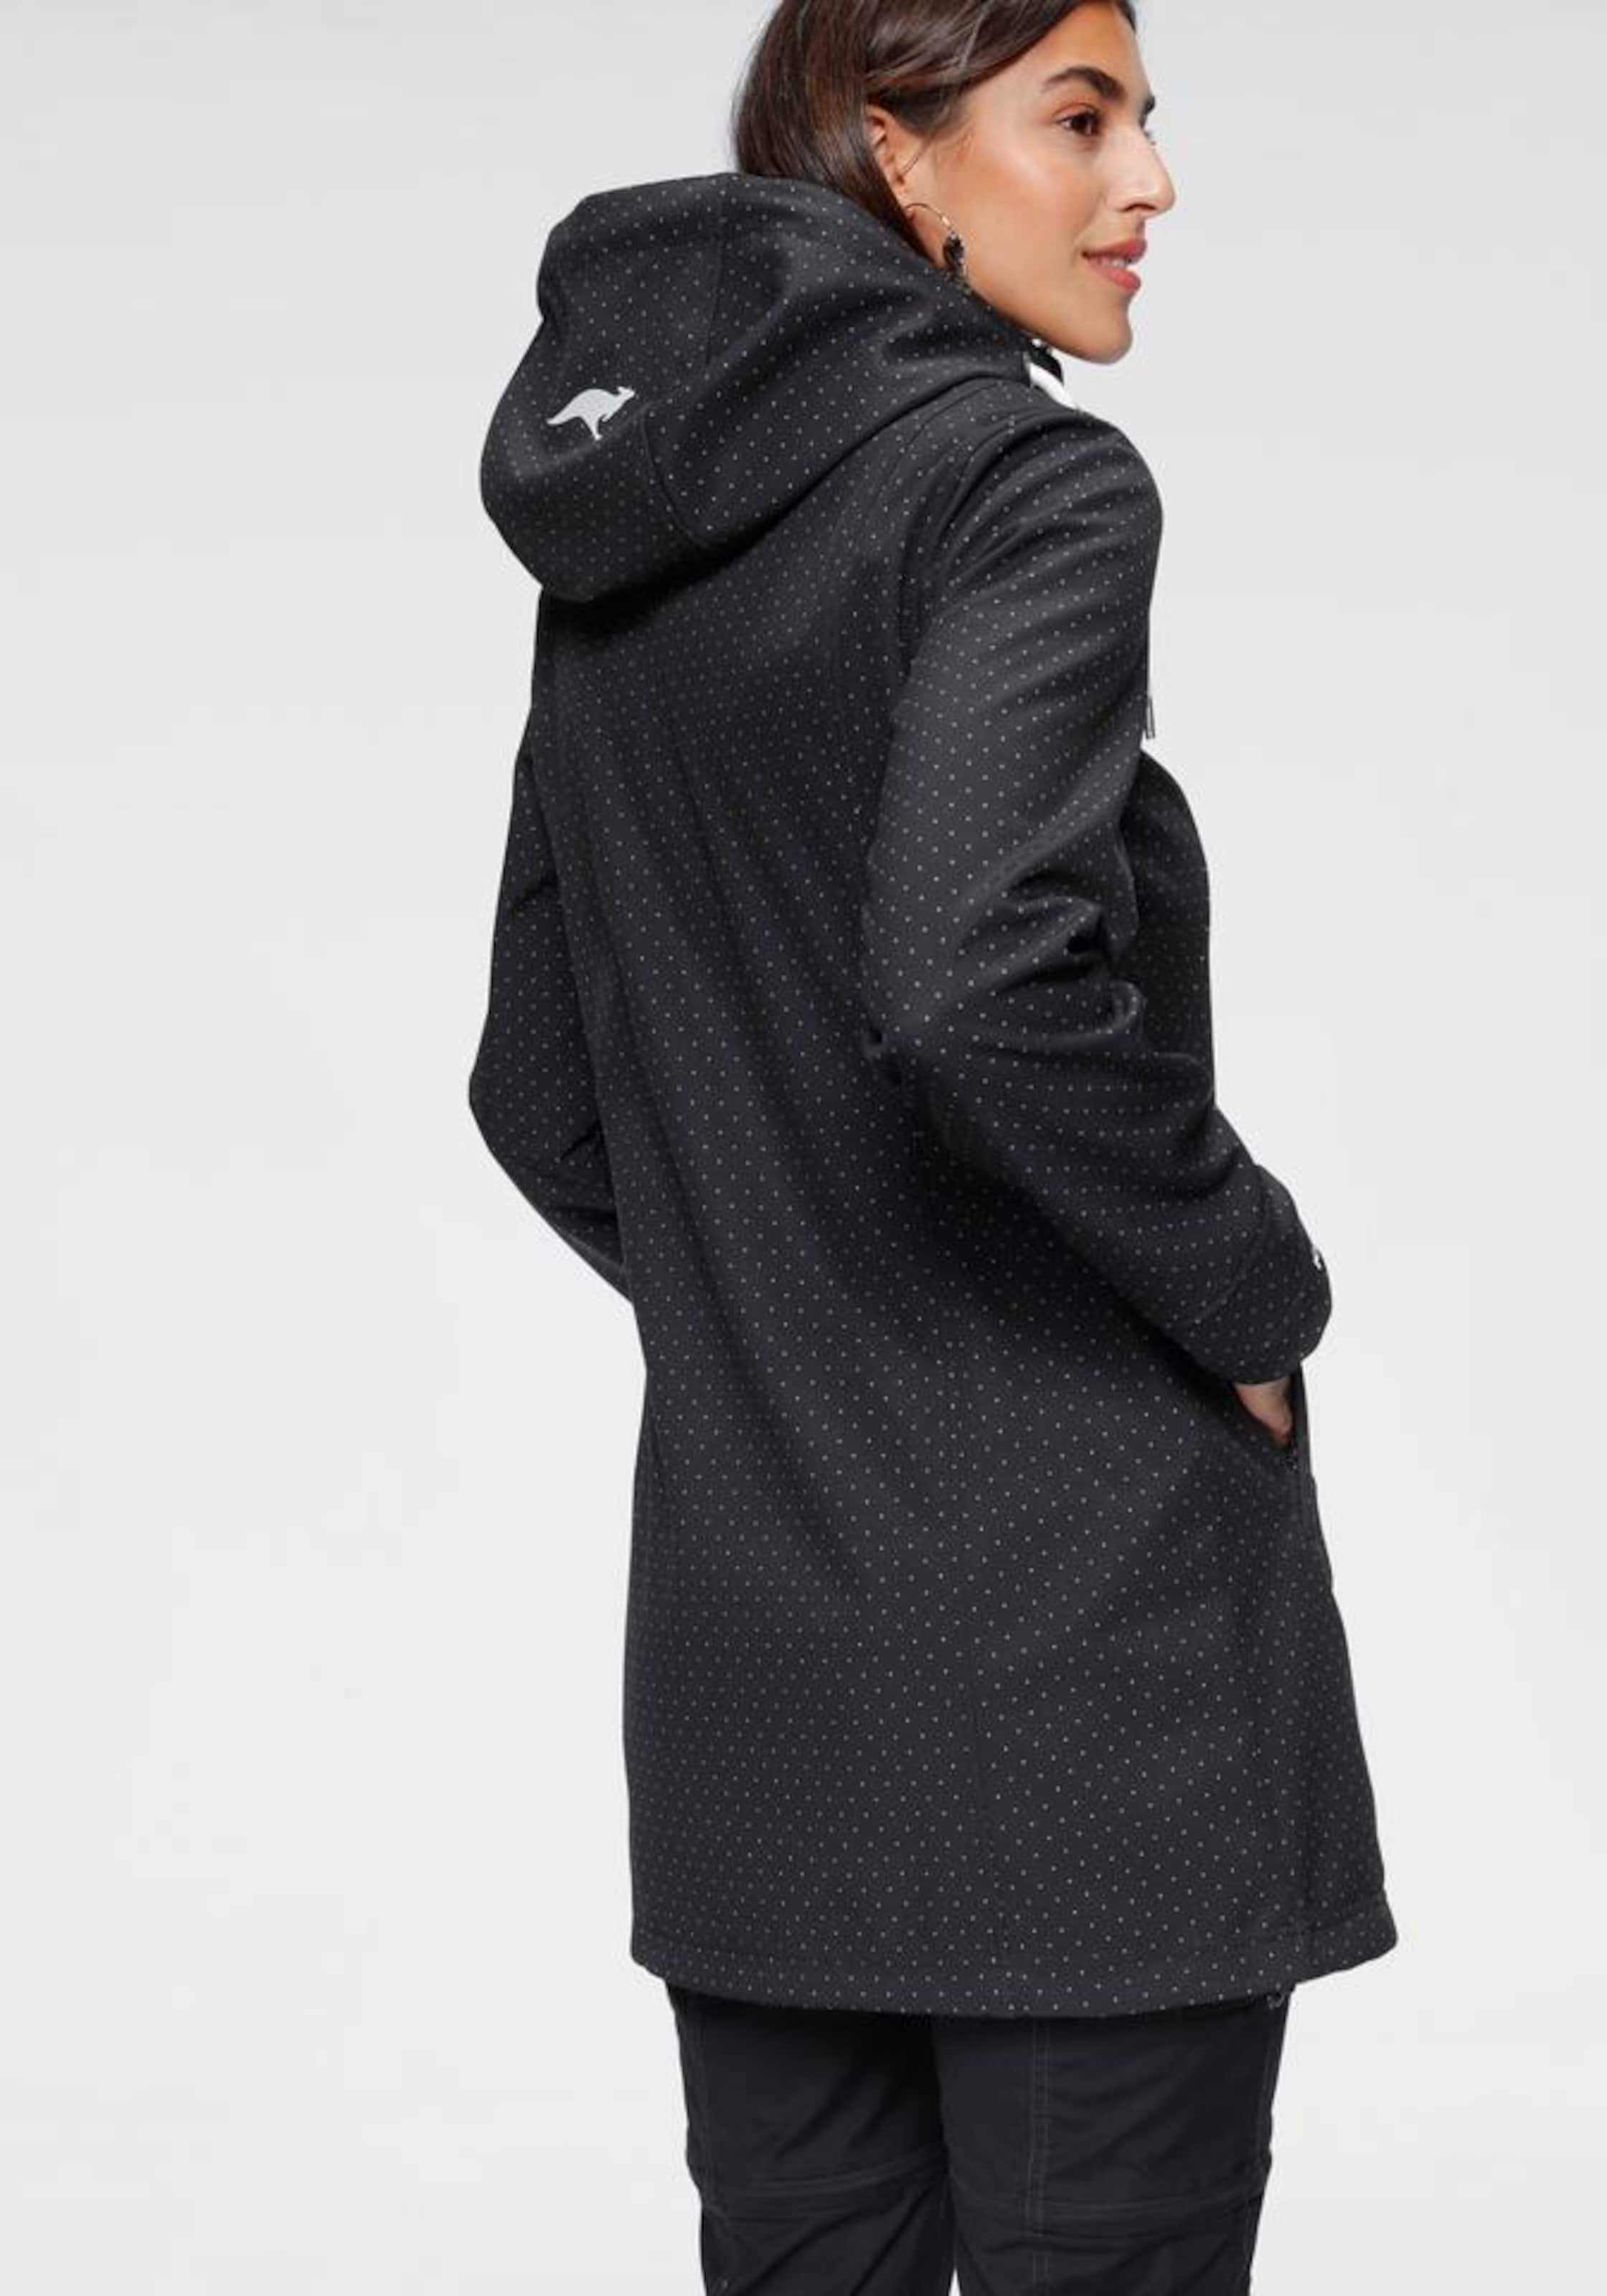 KangaROOS Outdoorjacke in schwarz / weiß